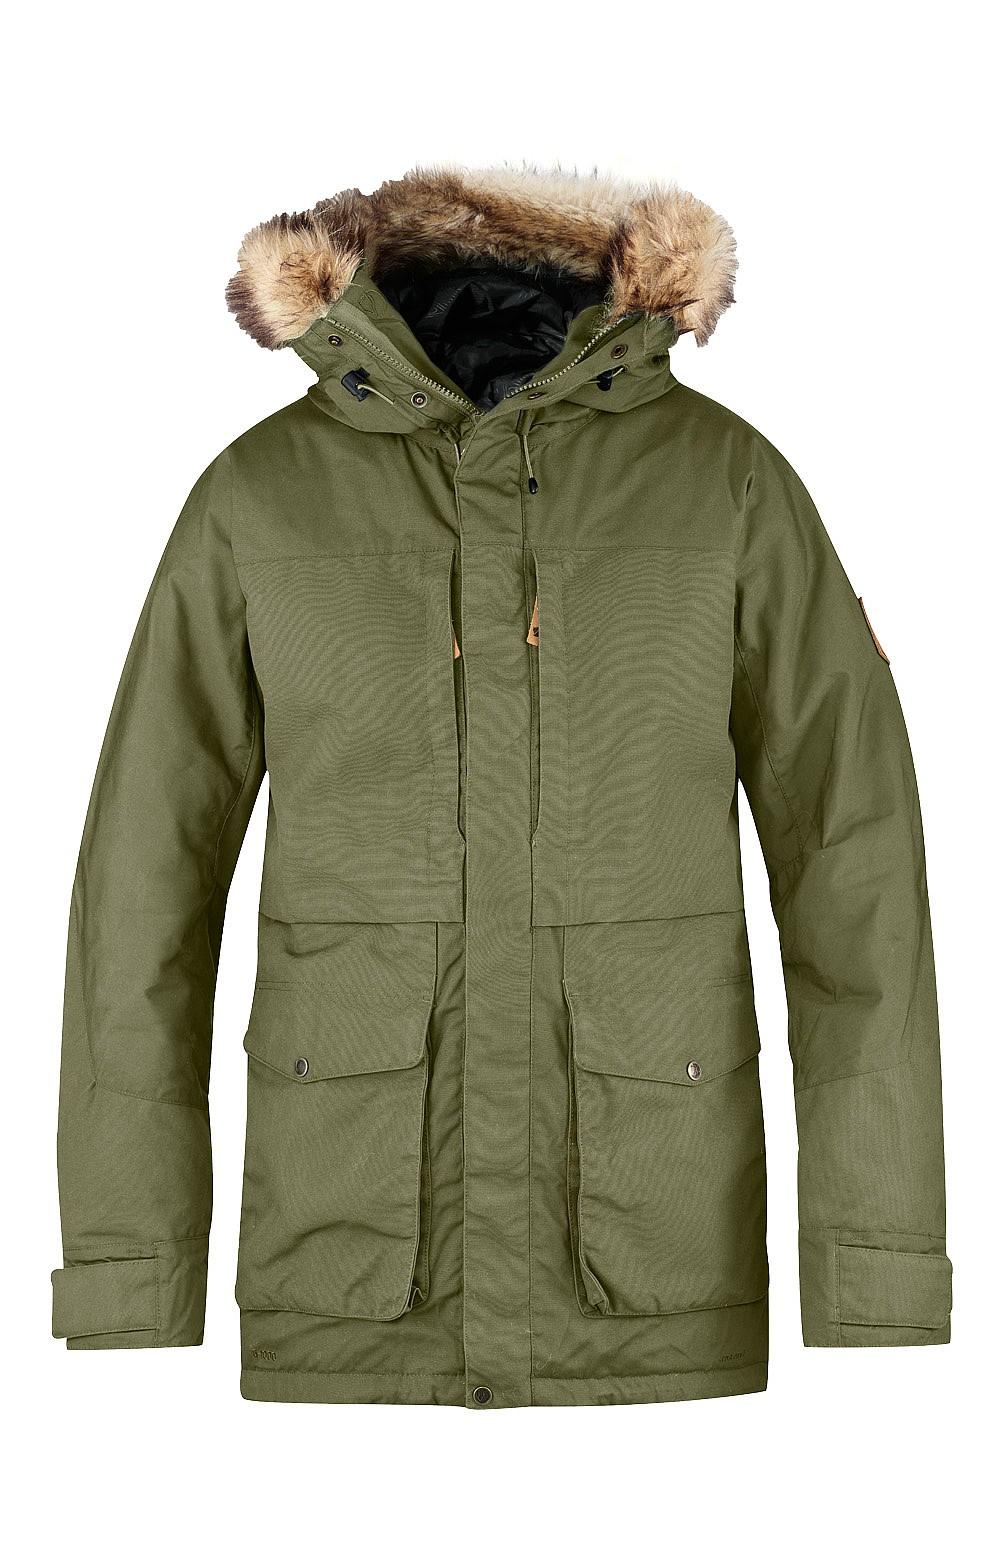 fda40b43 Fjallraven Barents Parka   Men's Waterproof & Wet Weather Coats   House Of  Bruar